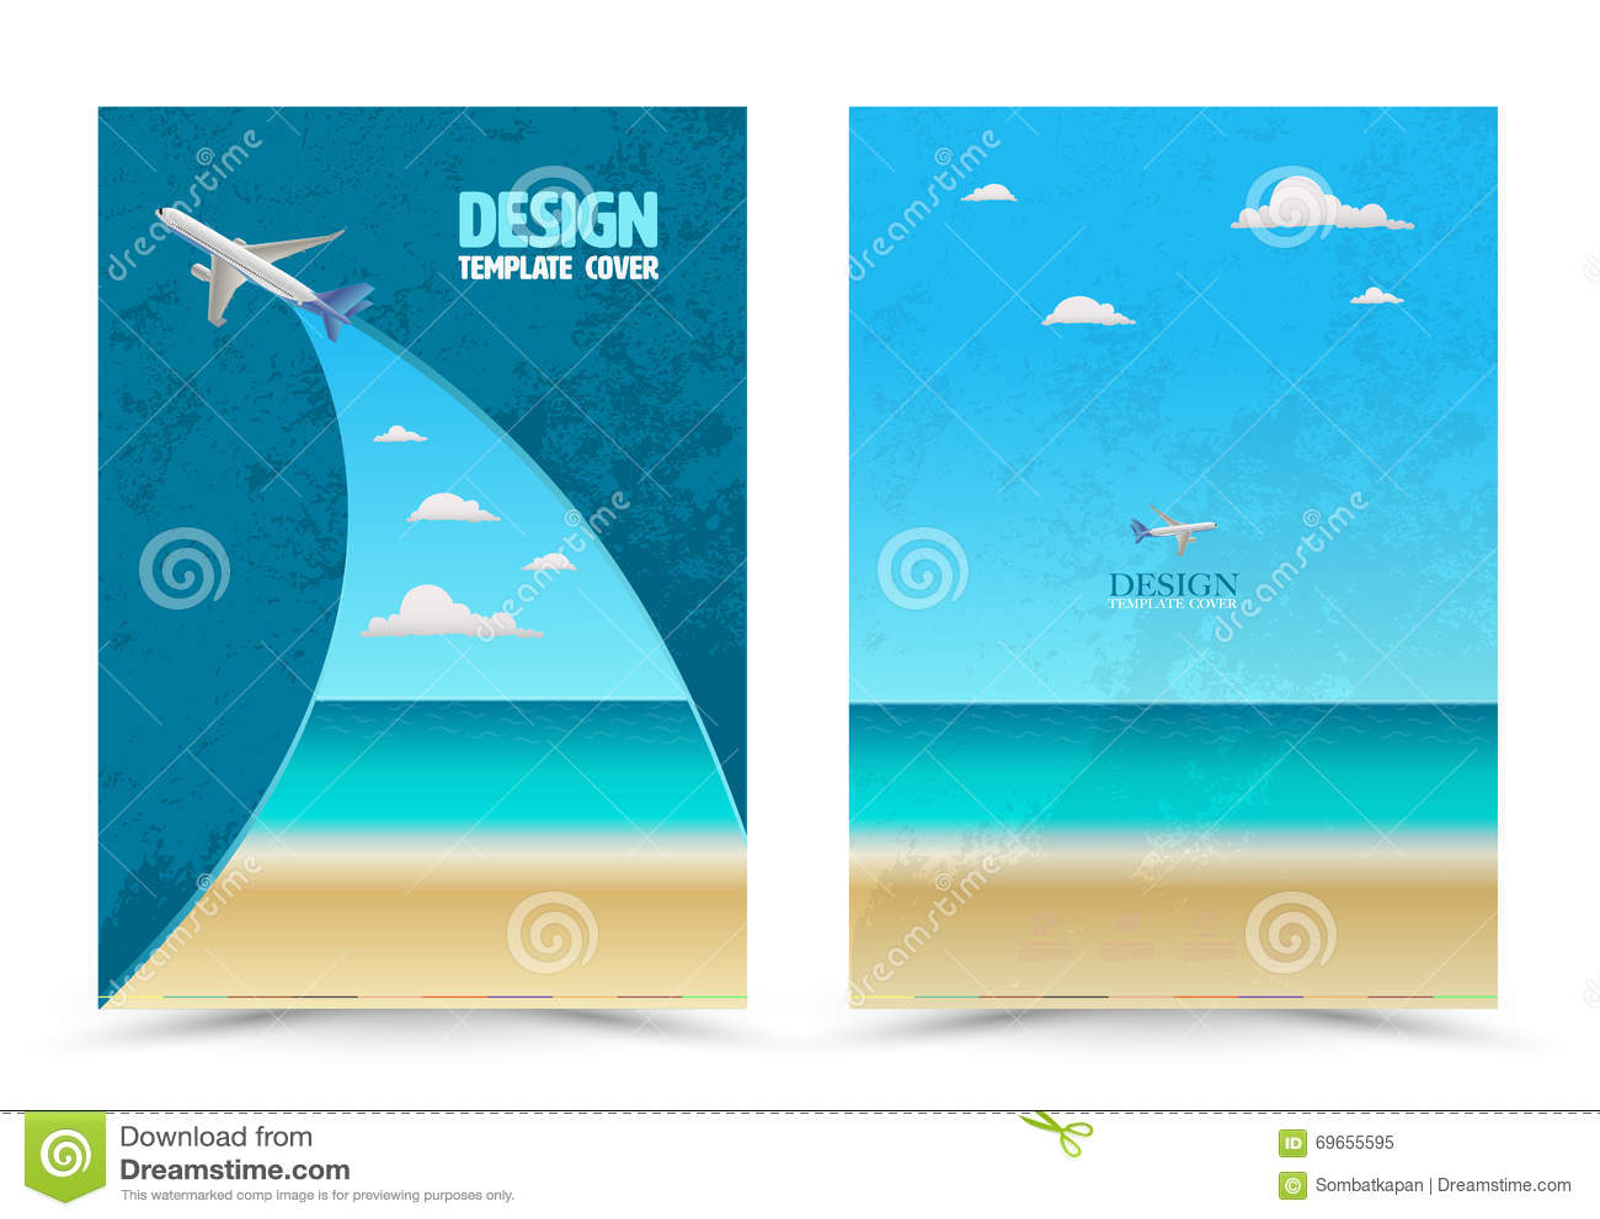 Deckblatt Planschablone Mit Flugzeug Vektor Abbildung Illustration